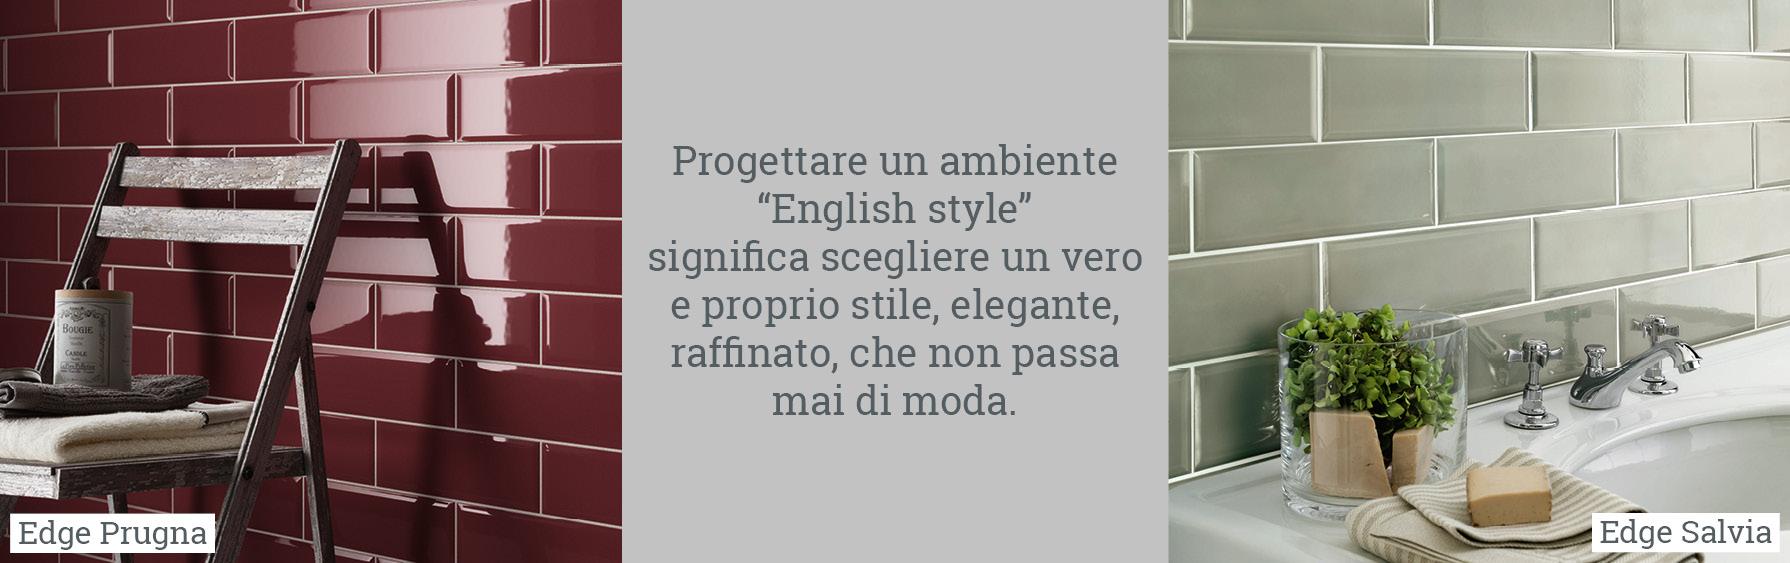 Lavandino Bagno In Inglese.Piastrelle Bagno Stile Inglese Stunning With Piastrelle Bagno Stile